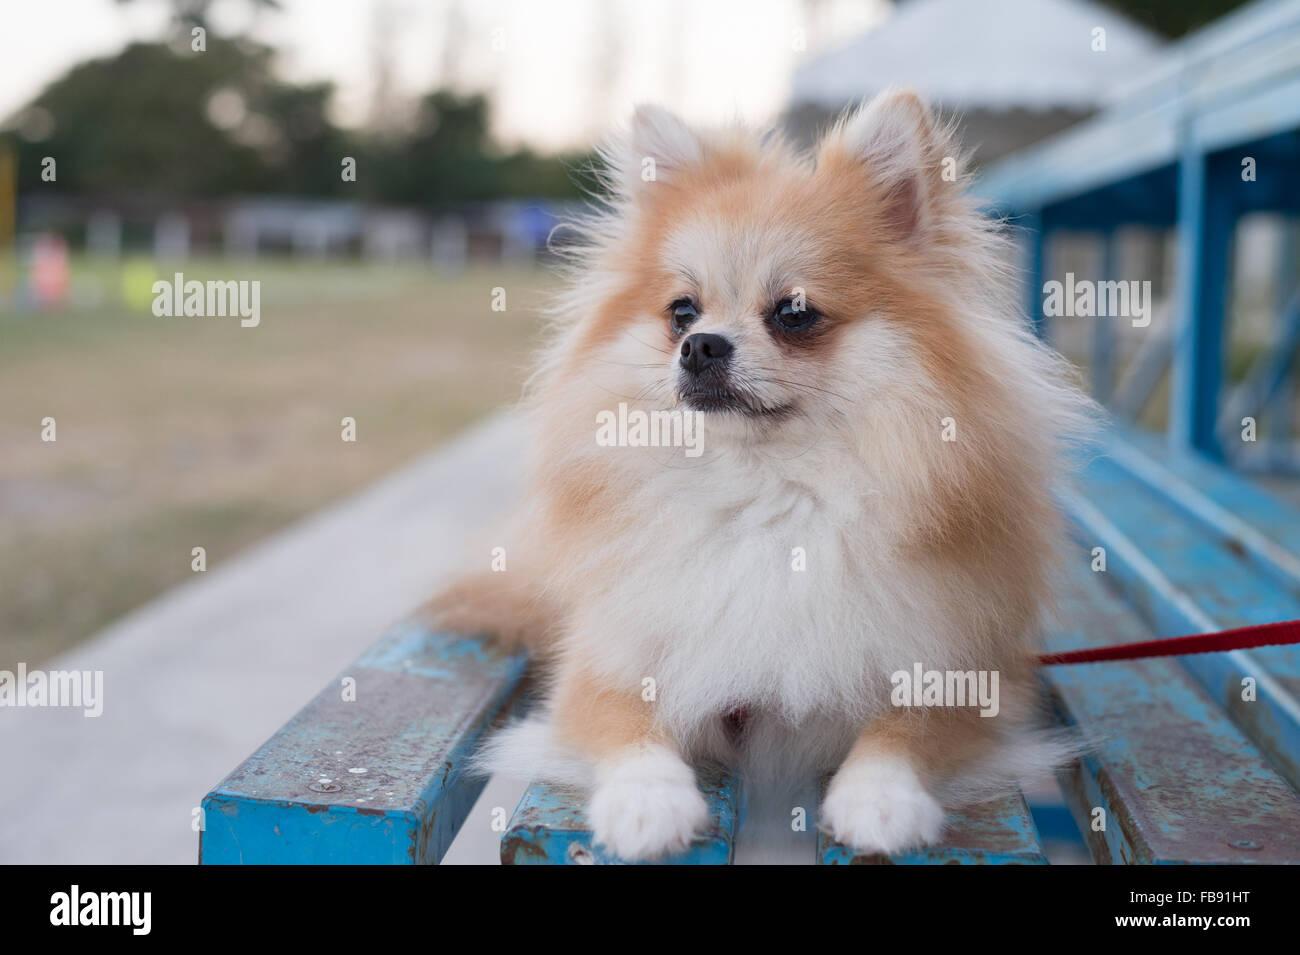 Pomeranian Dog Sitting On Amphitheater Stock Photo 93011908 Alamy